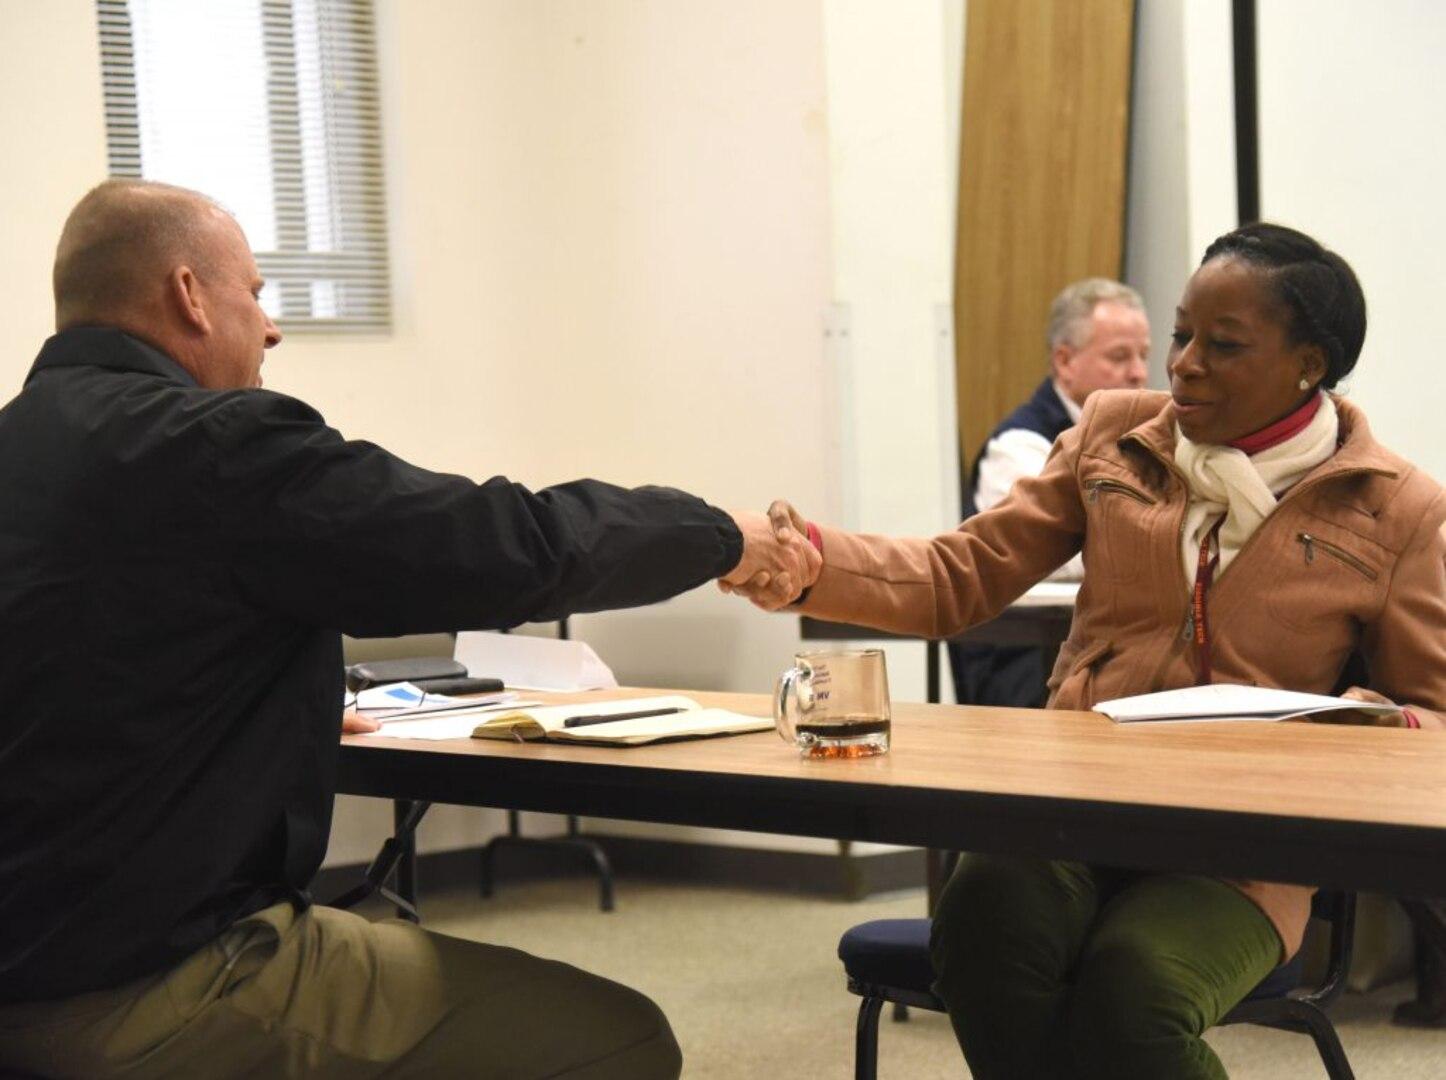 DMA Mentoring Program kicks off at meet and greet event